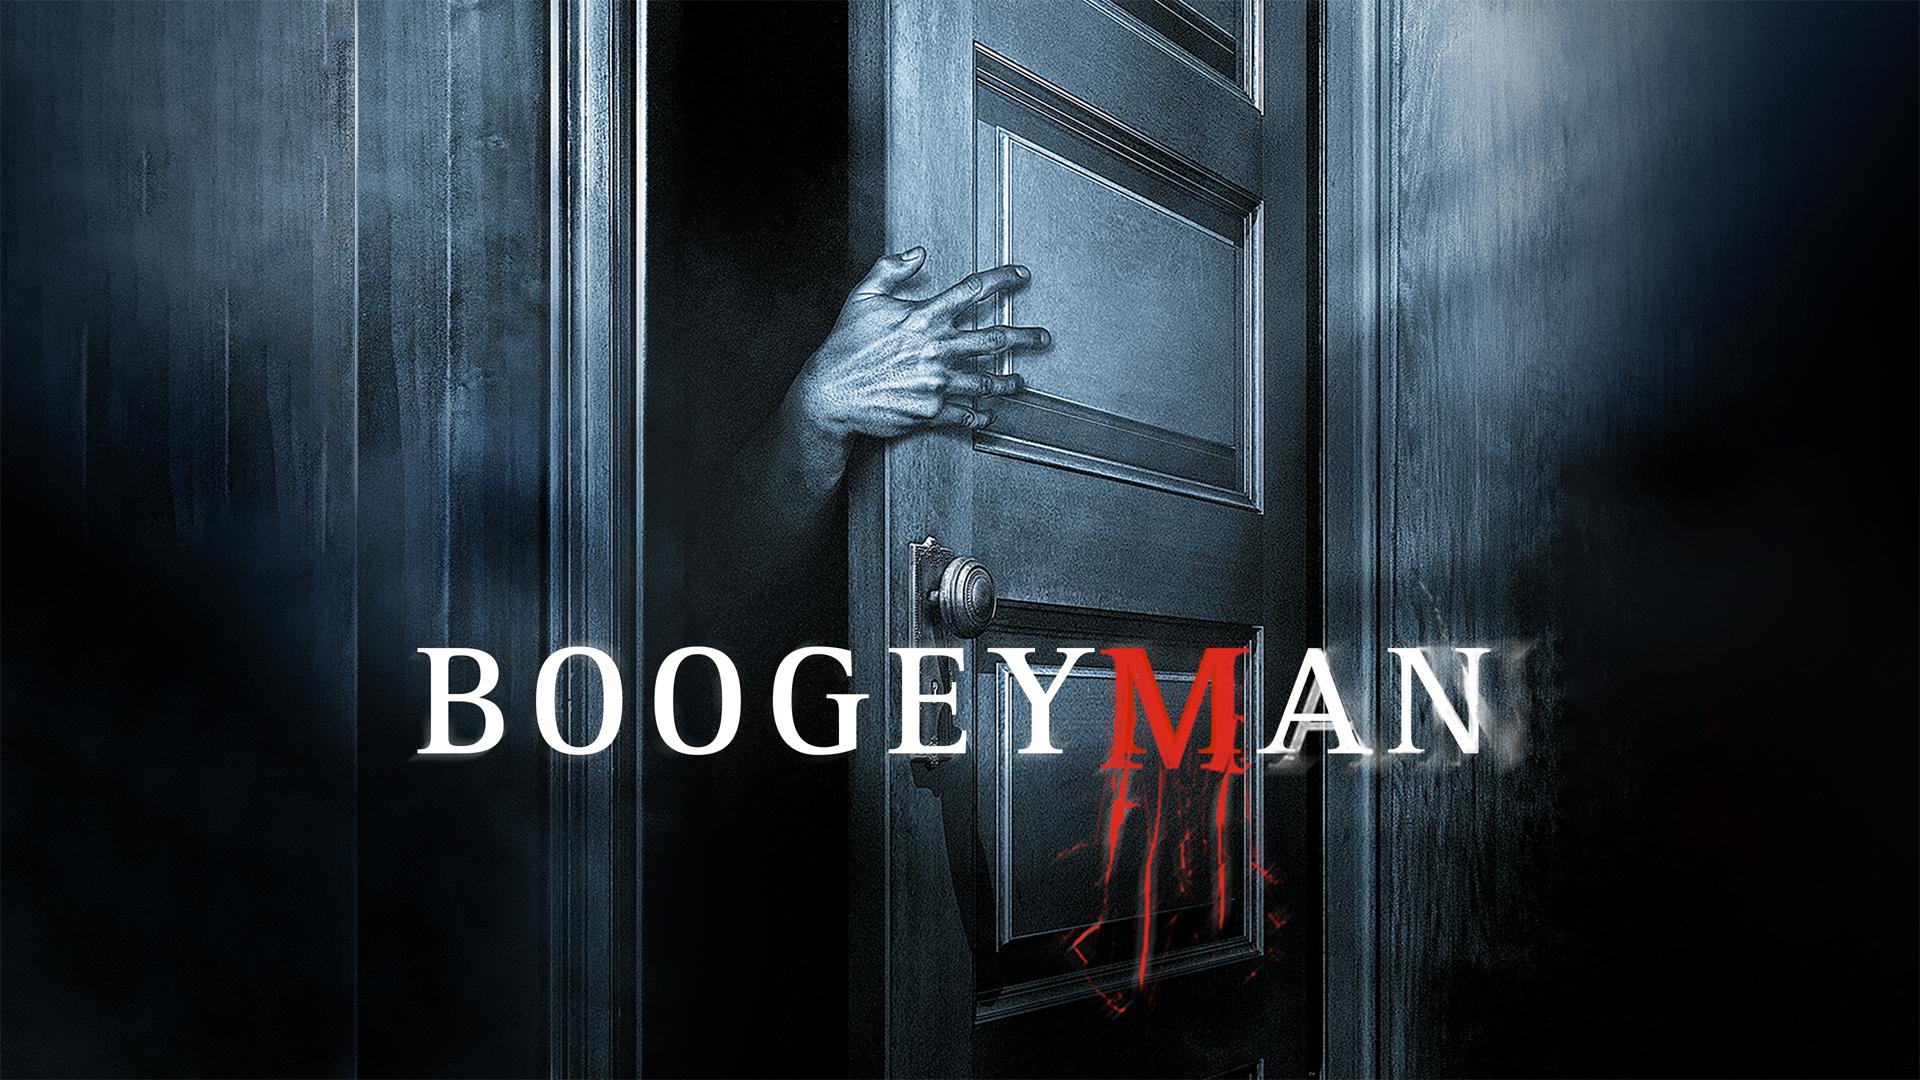 The Boogeyman (2005)